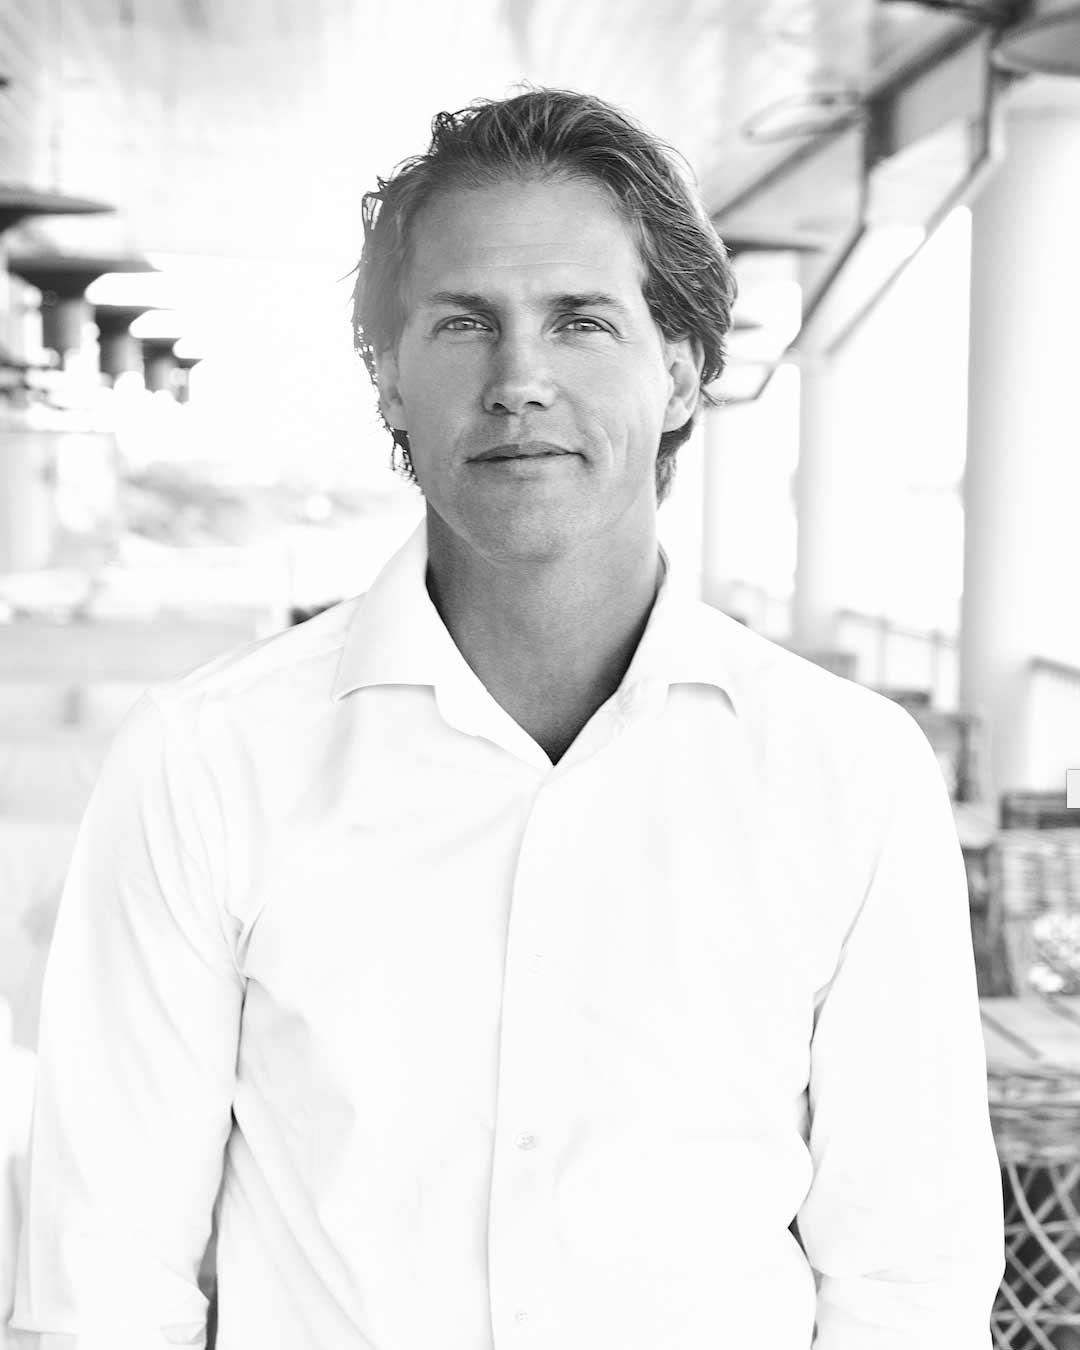 Jonas Stenberg